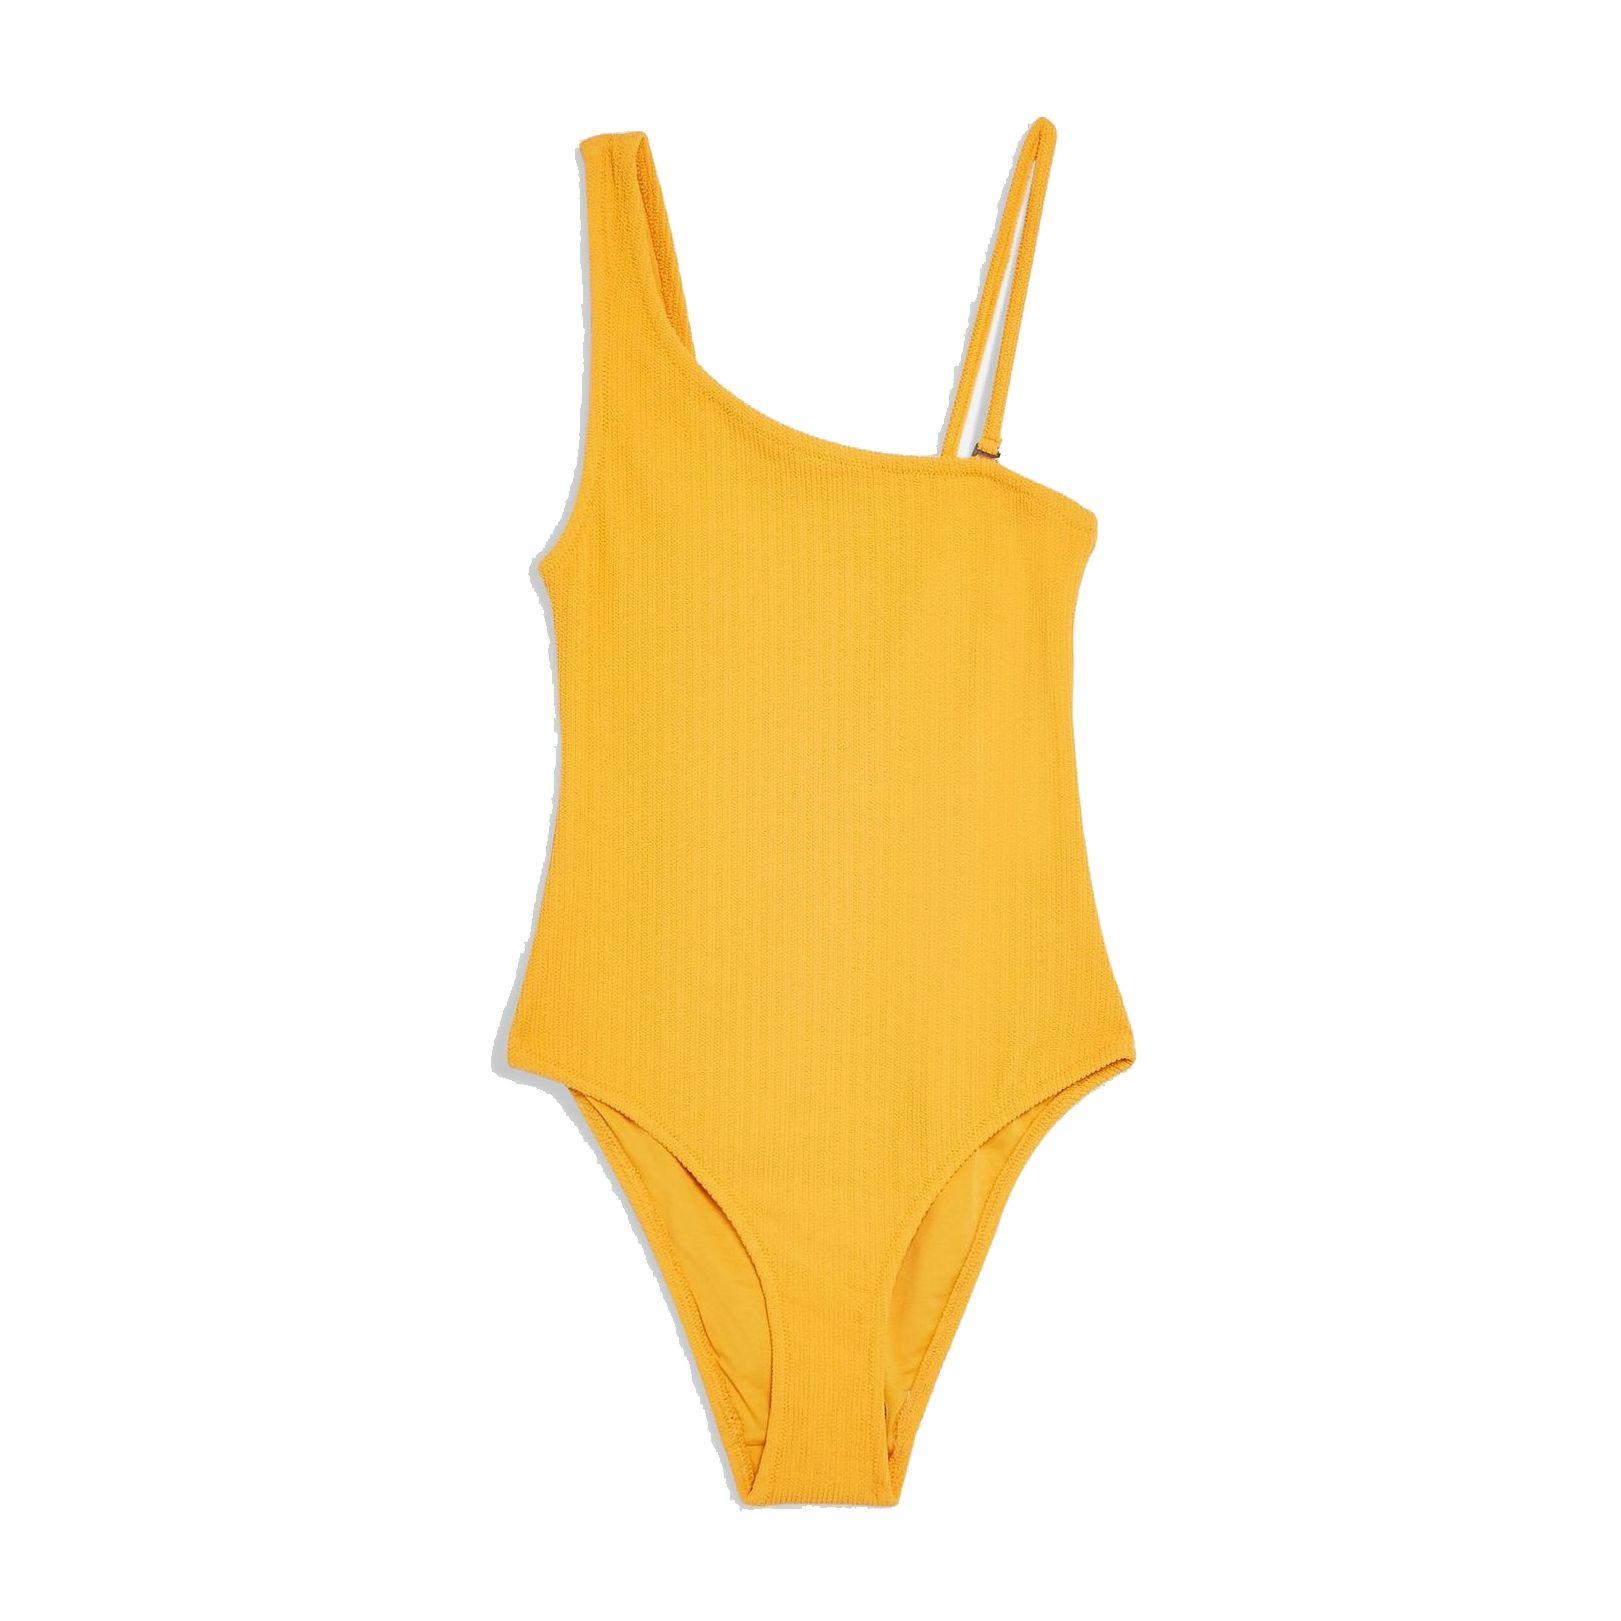 Ladies Swimwear is Dropping Online: WH Picks 30 Styles to Make a Splash In